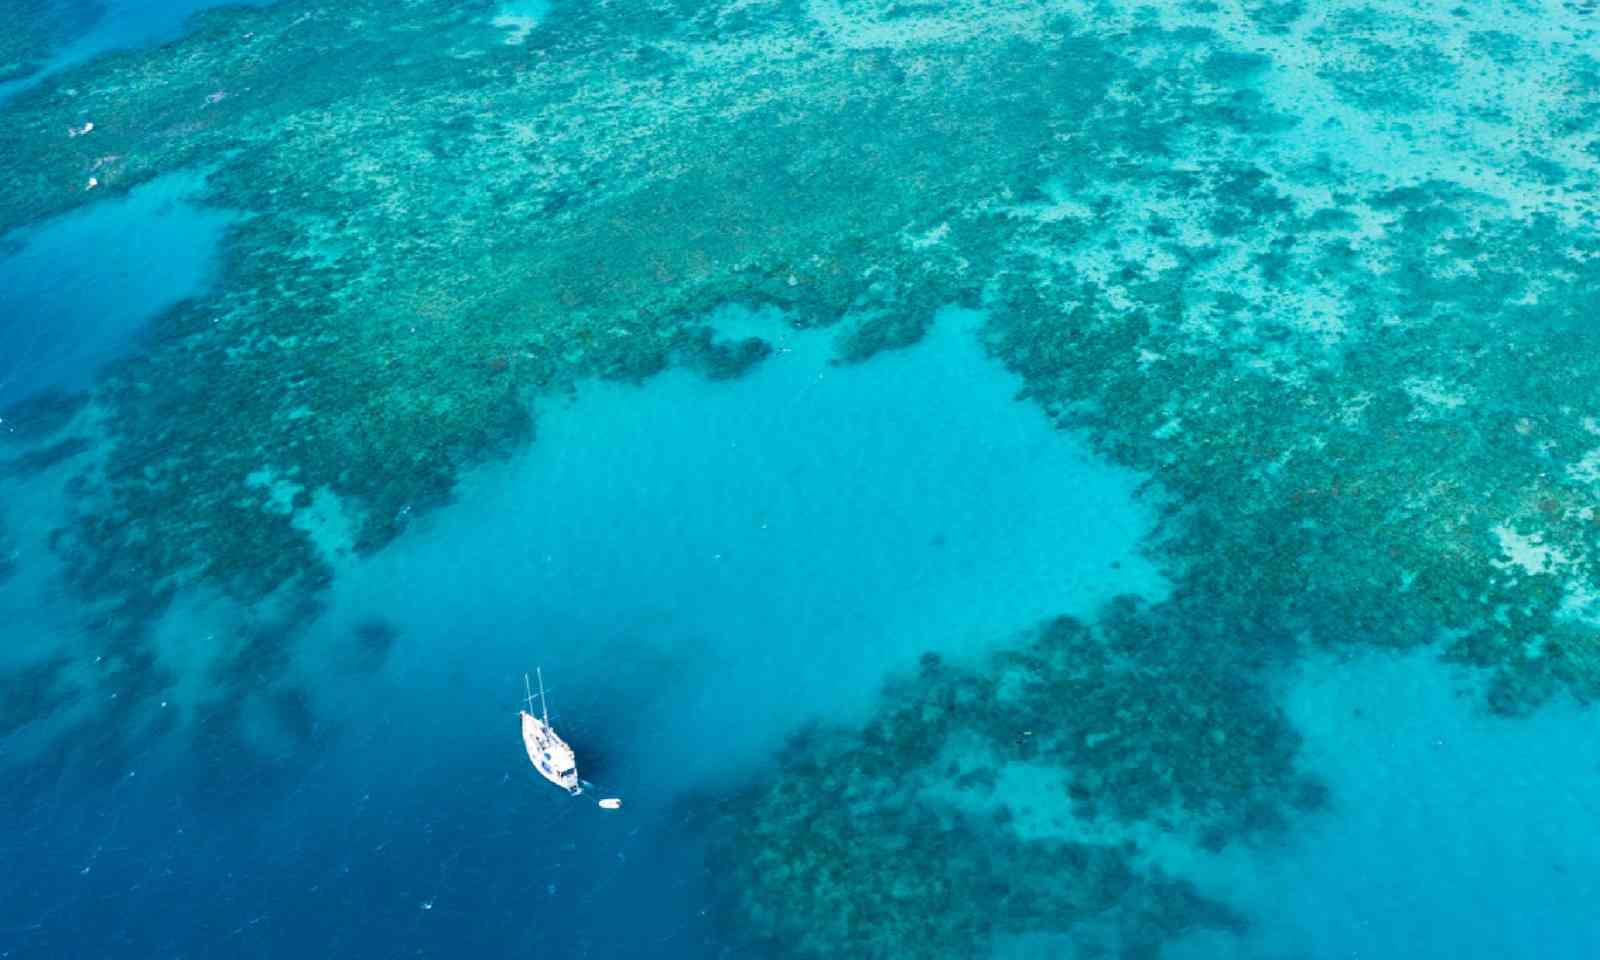 Liveaboard boat on the Great Barrier Reef (Shutterstock)